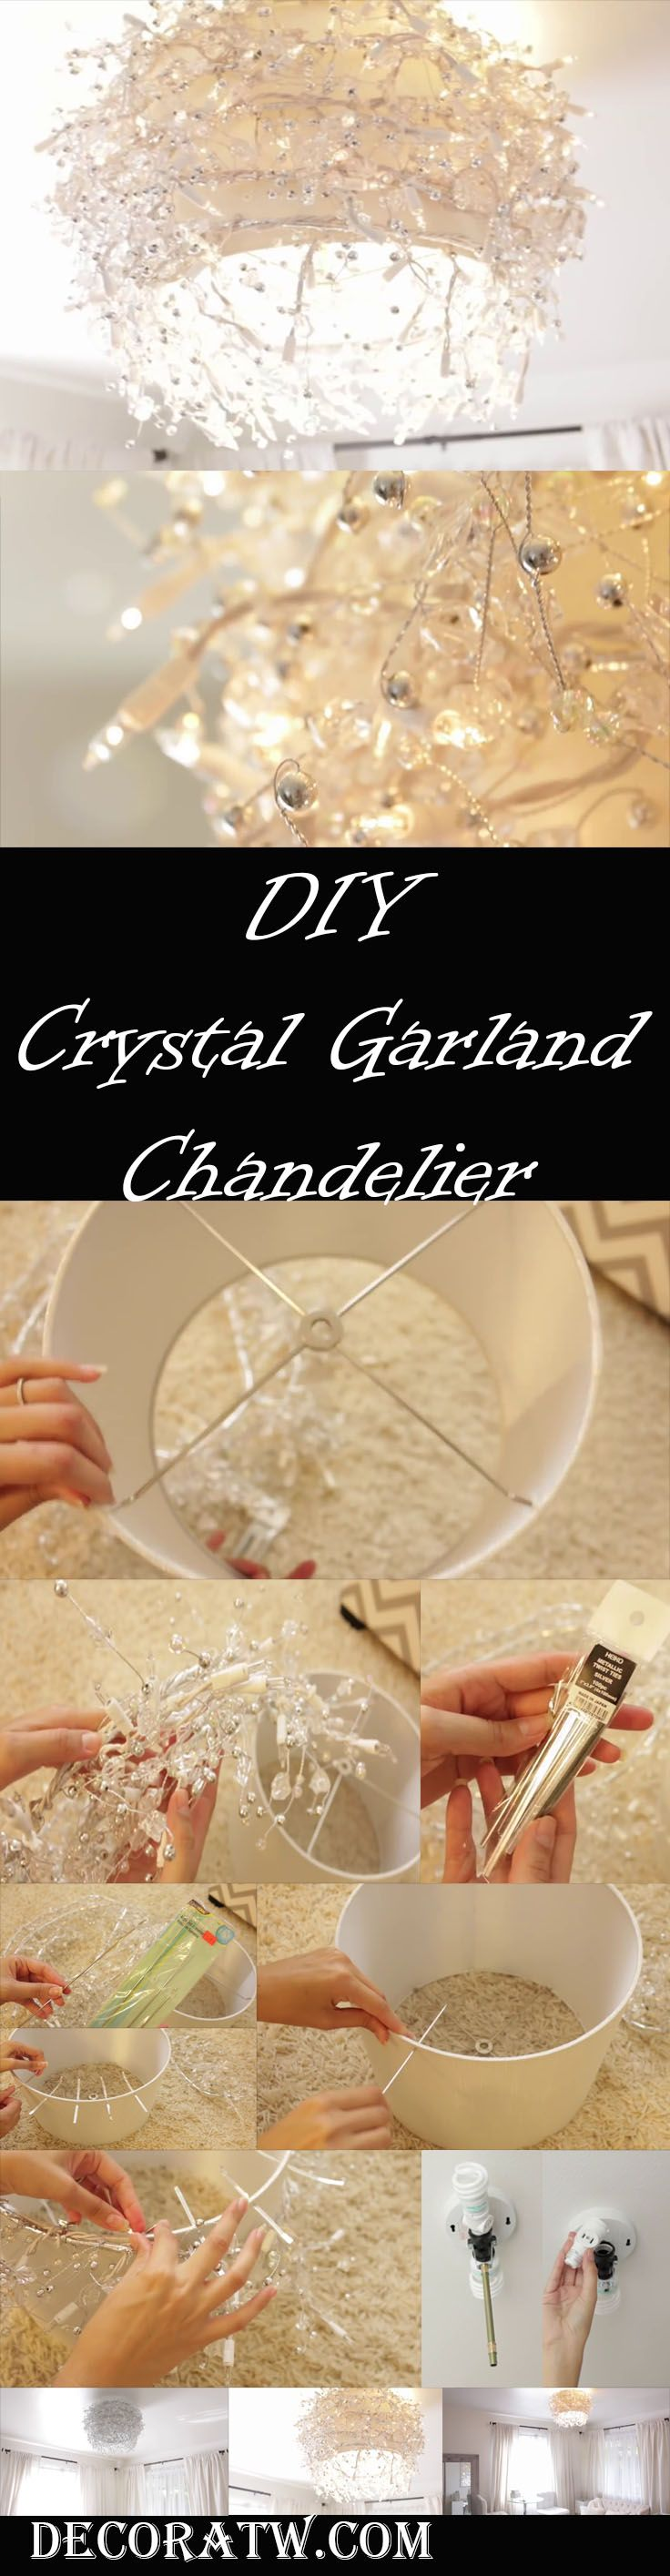 Best 25+ Lampshade chandelier ideas on Pinterest ...